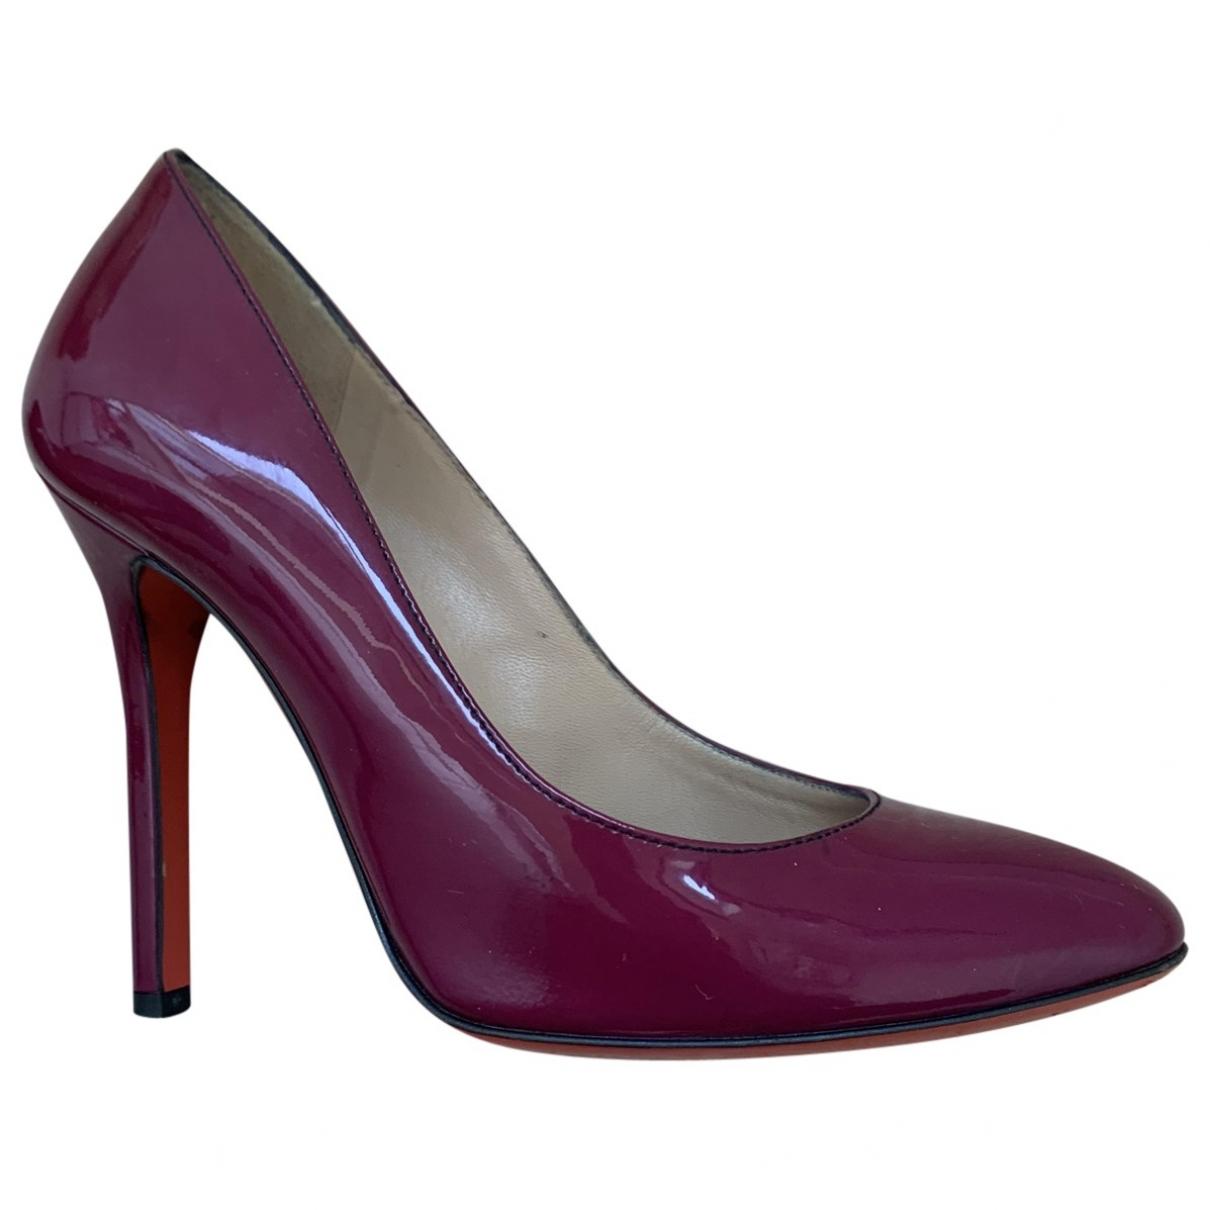 D&g \N Purple Patent leather Heels for Women 36 EU